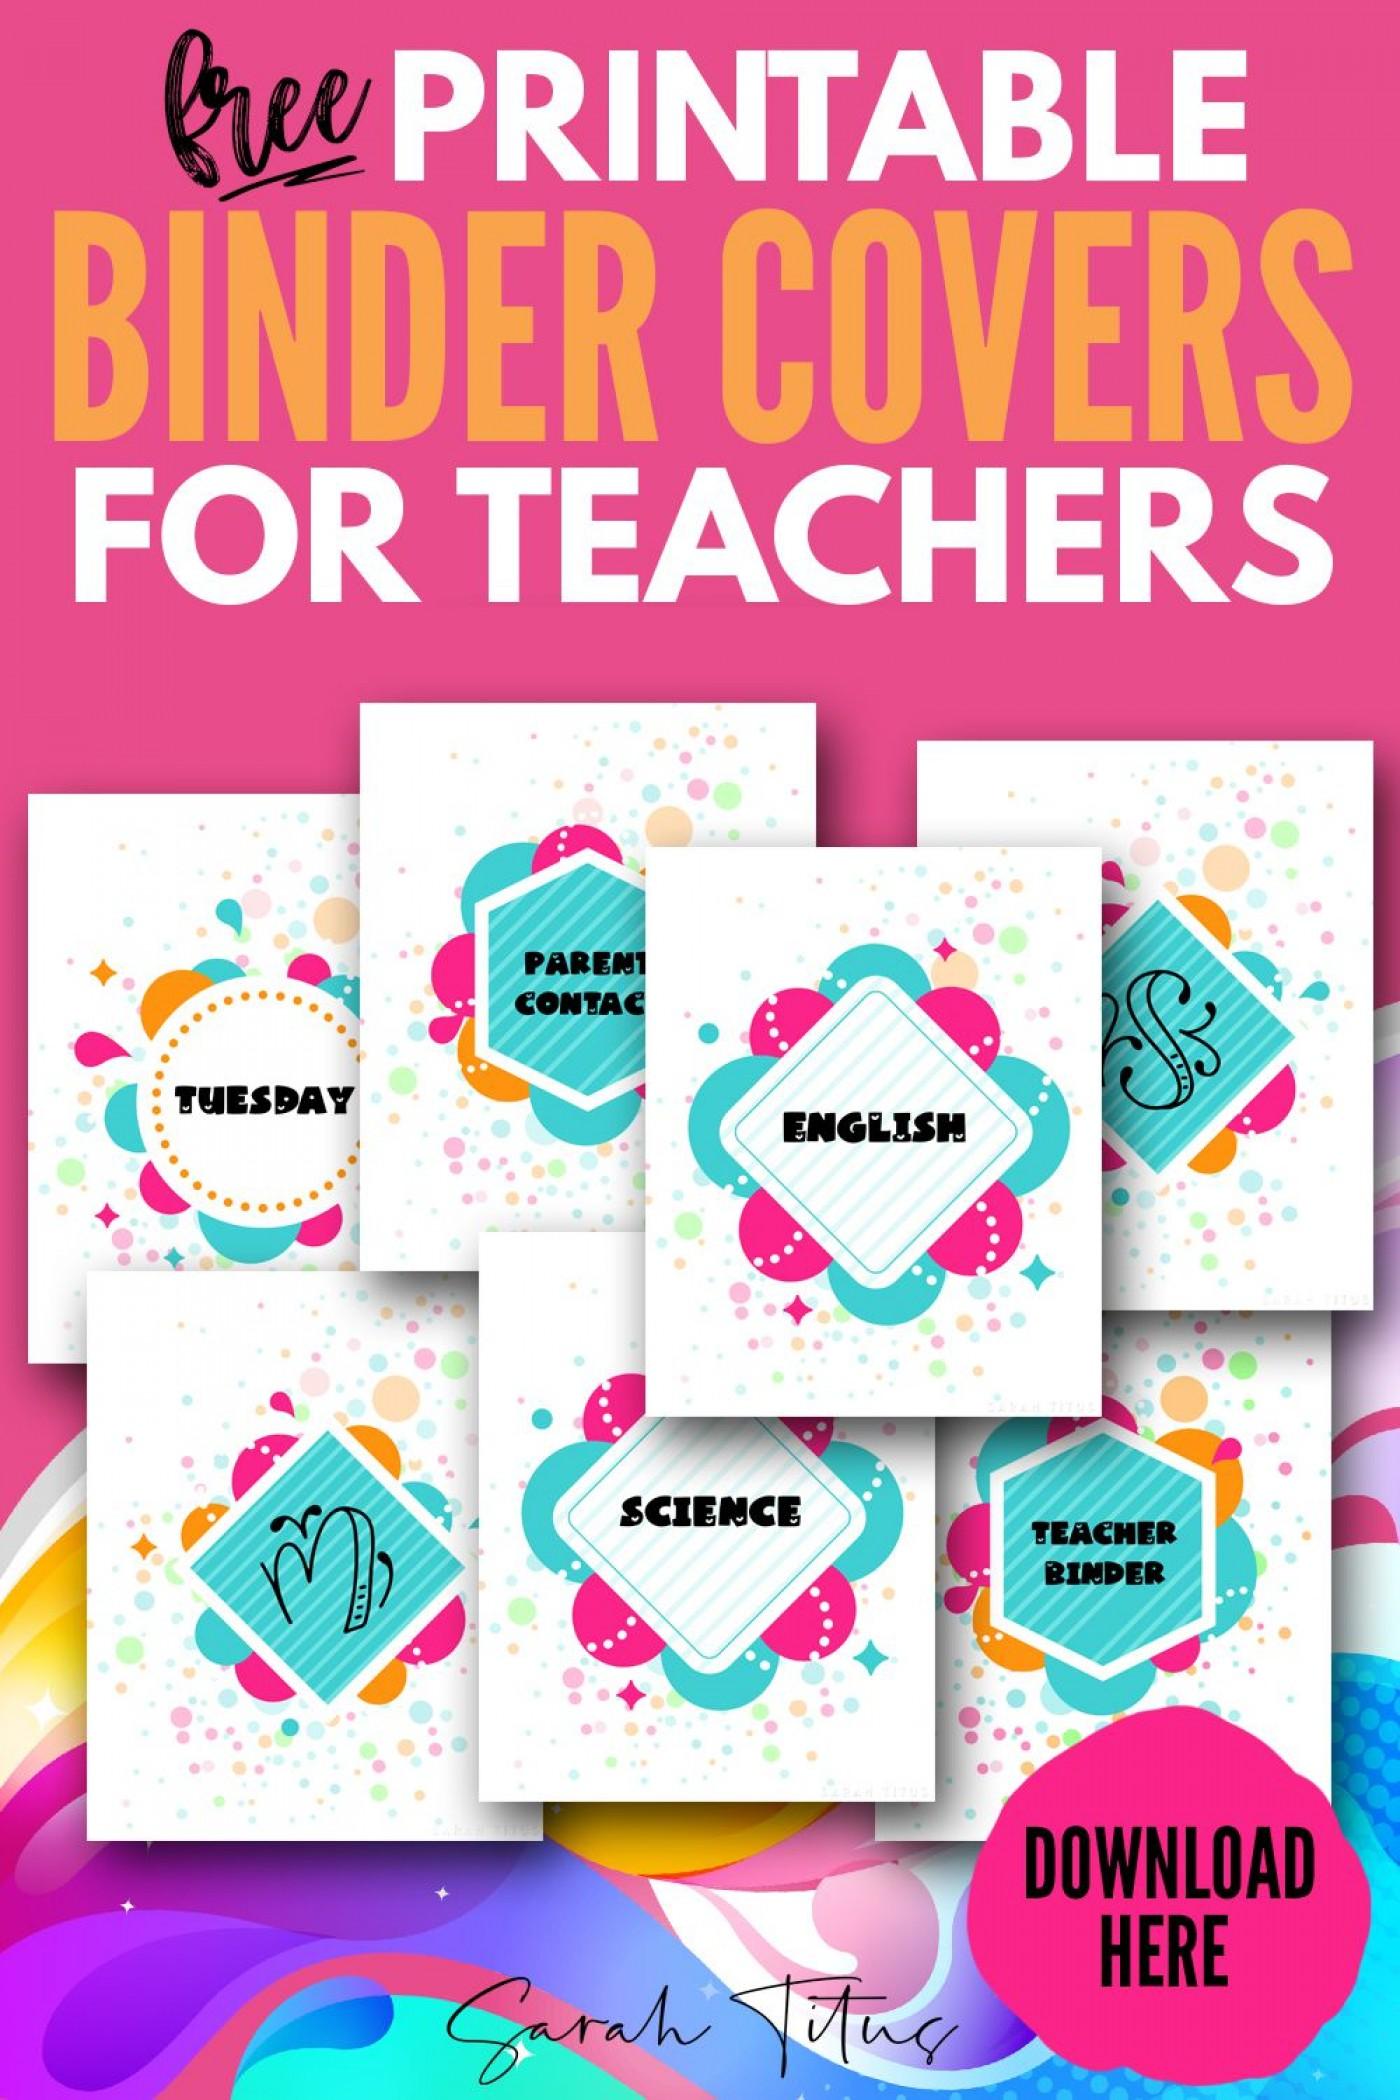 002 Awesome Free Printable Teacher Binder Template Inspiration 1400